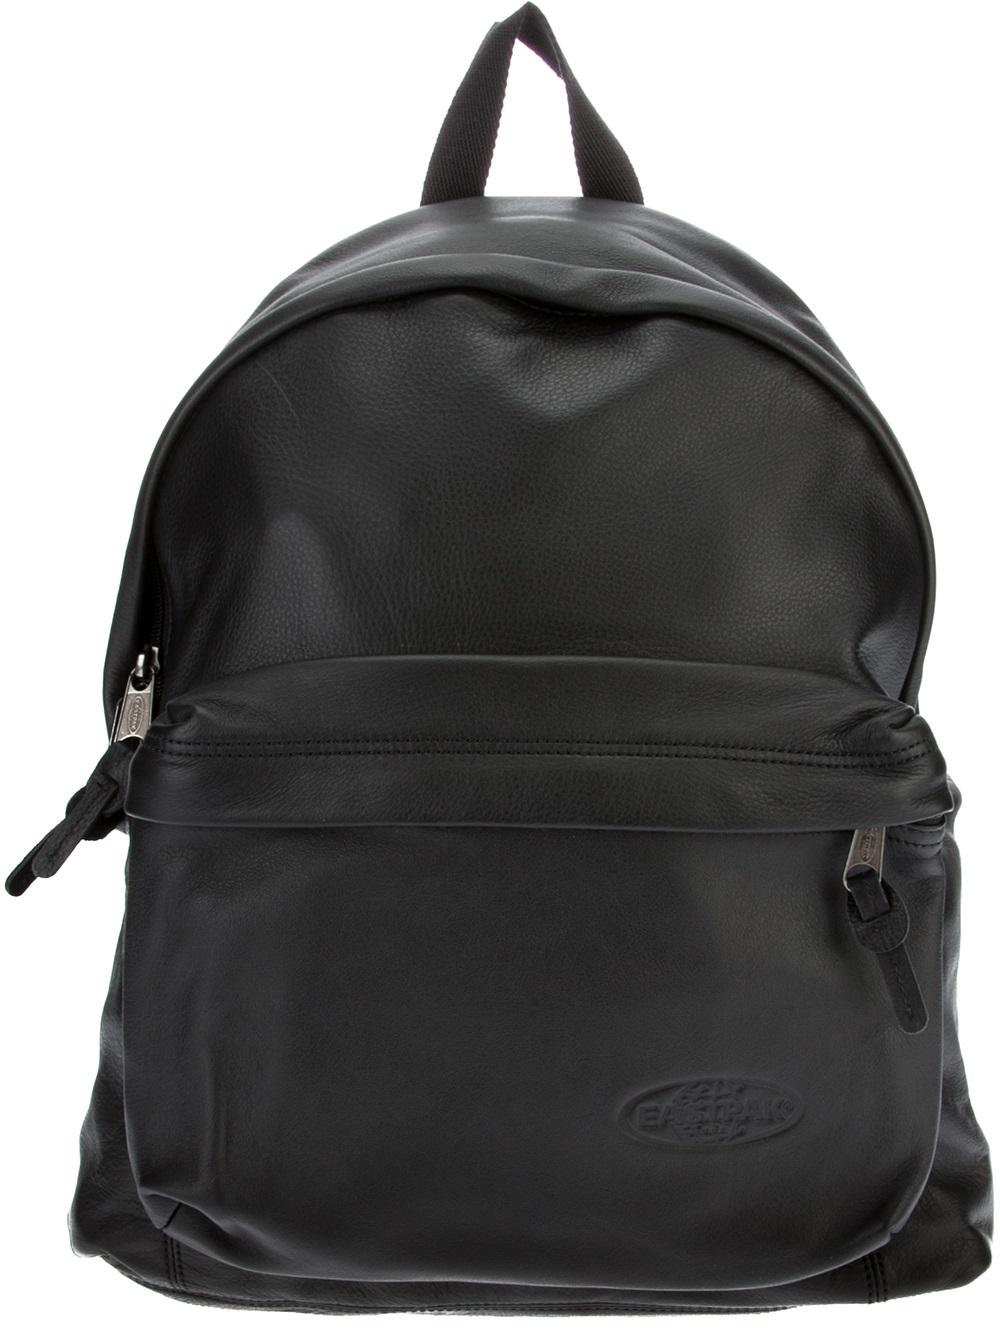 Leather Eastpak Backpack: Eastpak Classic Leather Backpack In Black For Men